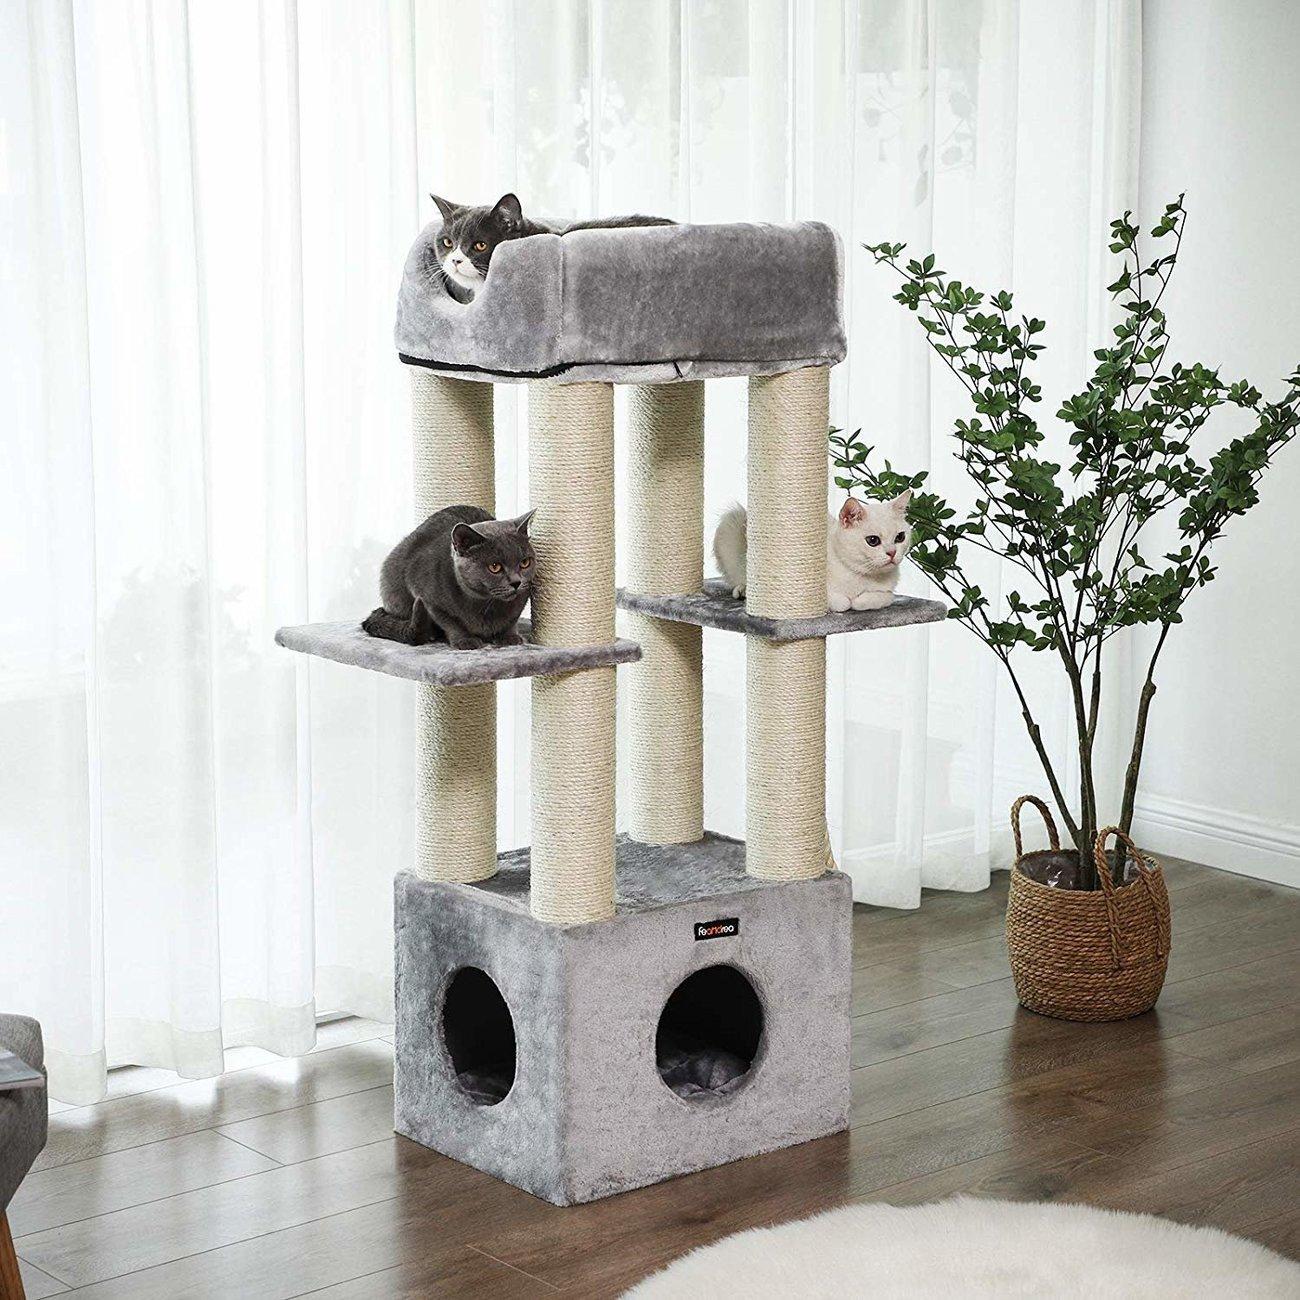 FEANDREA Katzen Kratzbaum mit Aussichtsplattform, Bild 6